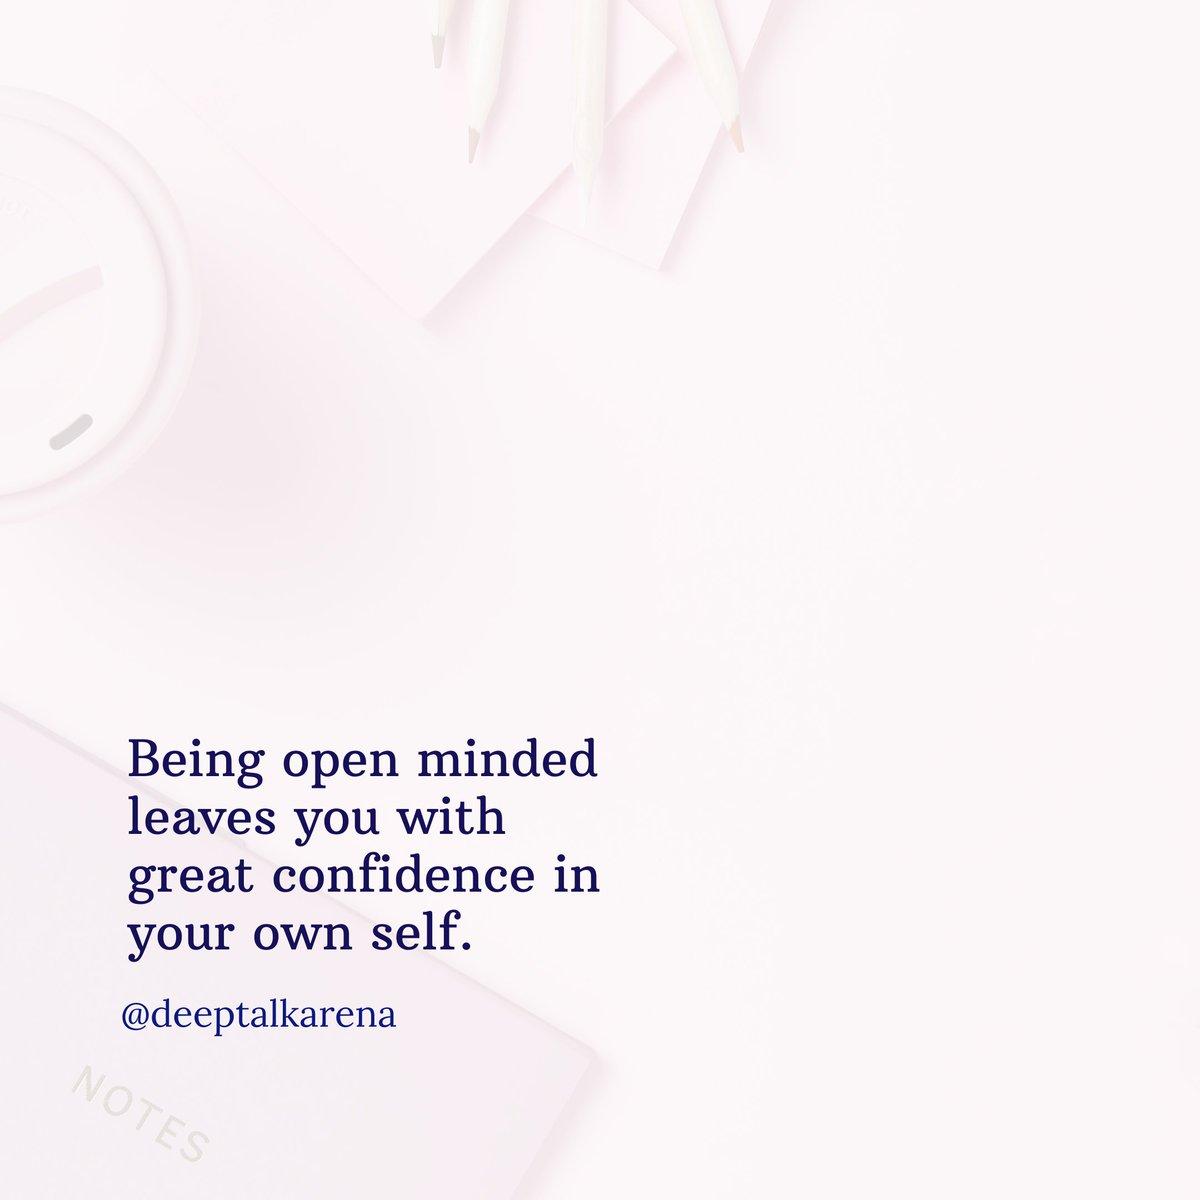 Good Morning! #happysunday #growth #sundaymorninggrowth #dailygrowth #sundaymorningview #sundaymorningvibes #sundaymorningblessings #sundaymorningpost #sundaymorningmusings #selfconfidence #selfconfidencequotes #selfconfidenceiskey #selfconfidenceboostpic.twitter.com/soTVqCWg4v